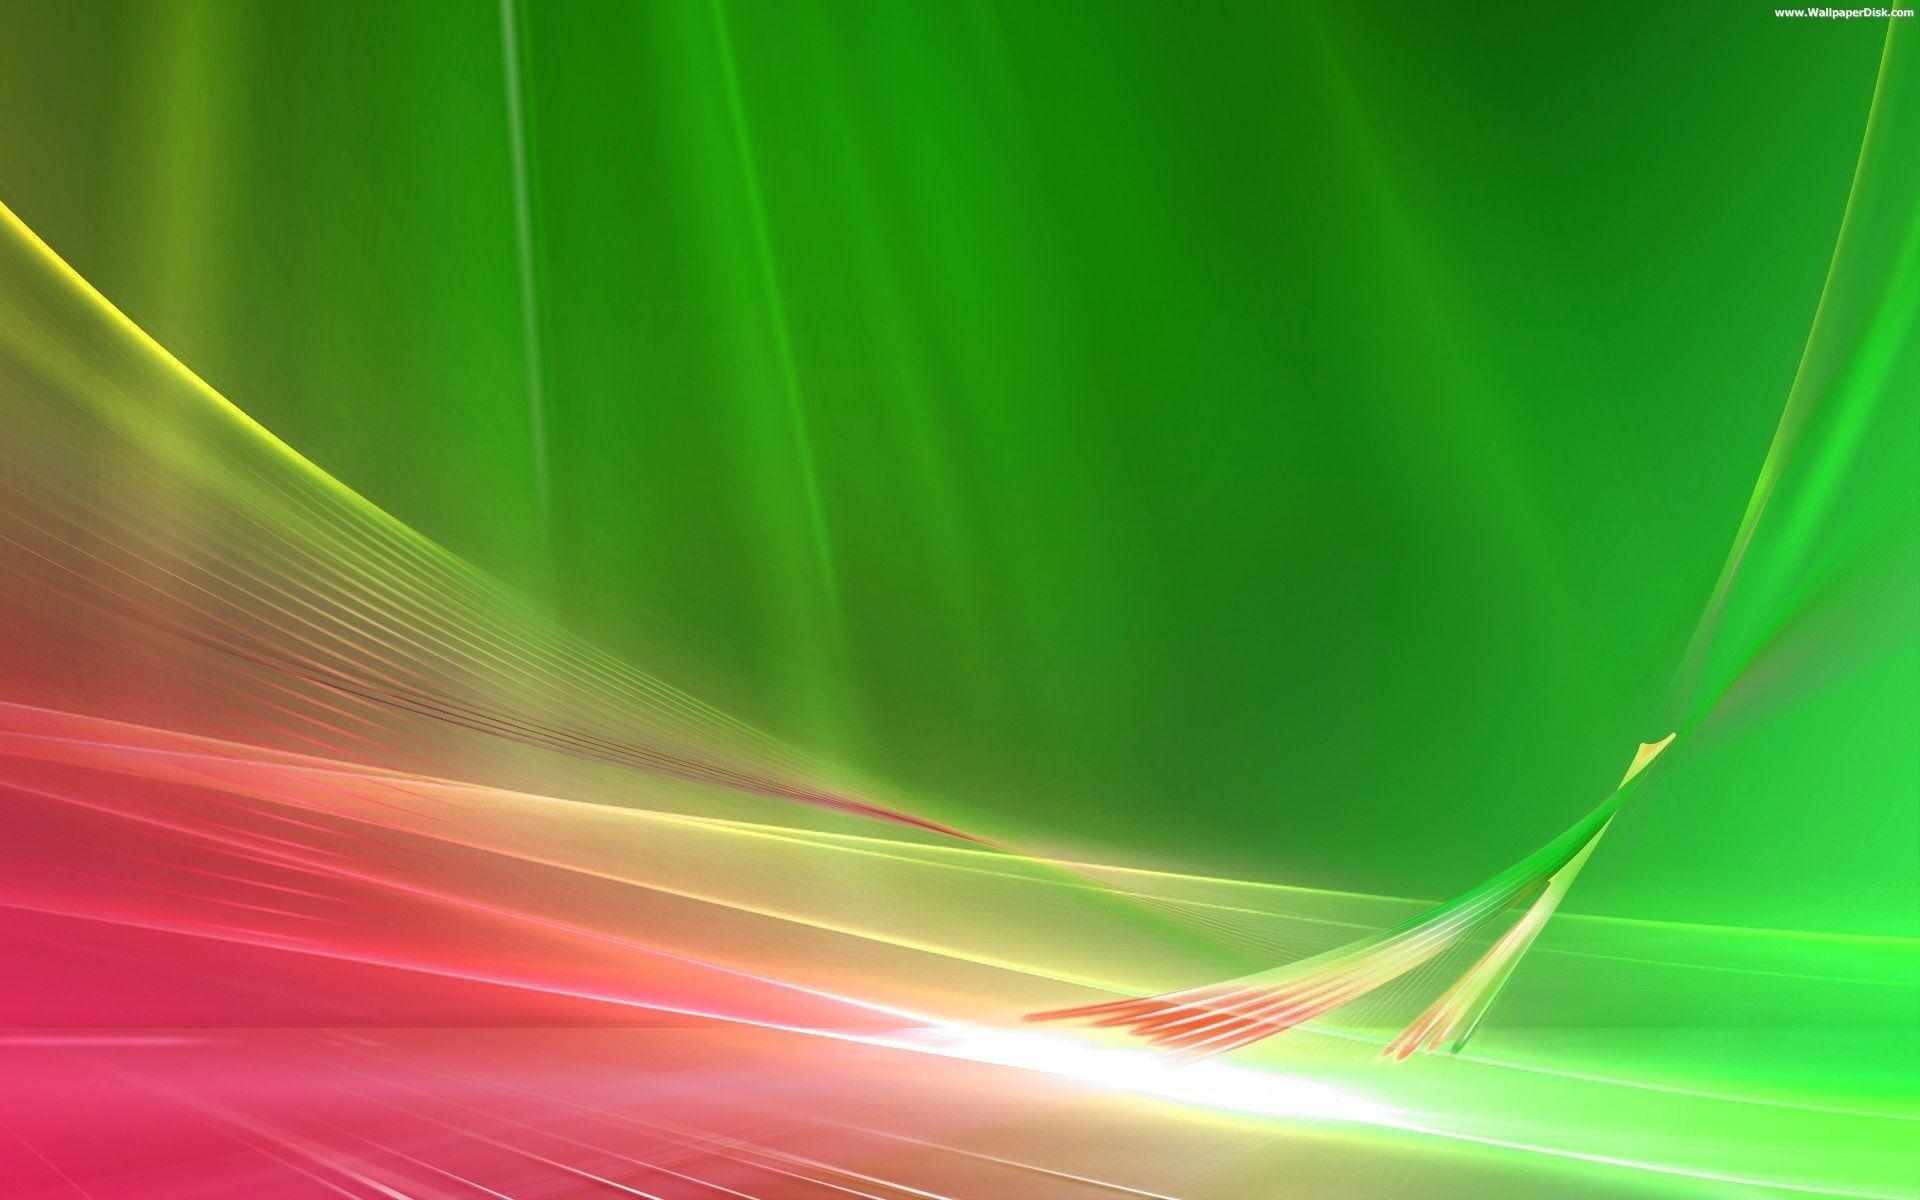 Inspirational Windows Vista Background Pink And Green Wallpaper Red Wallpaper Green Wallpaper